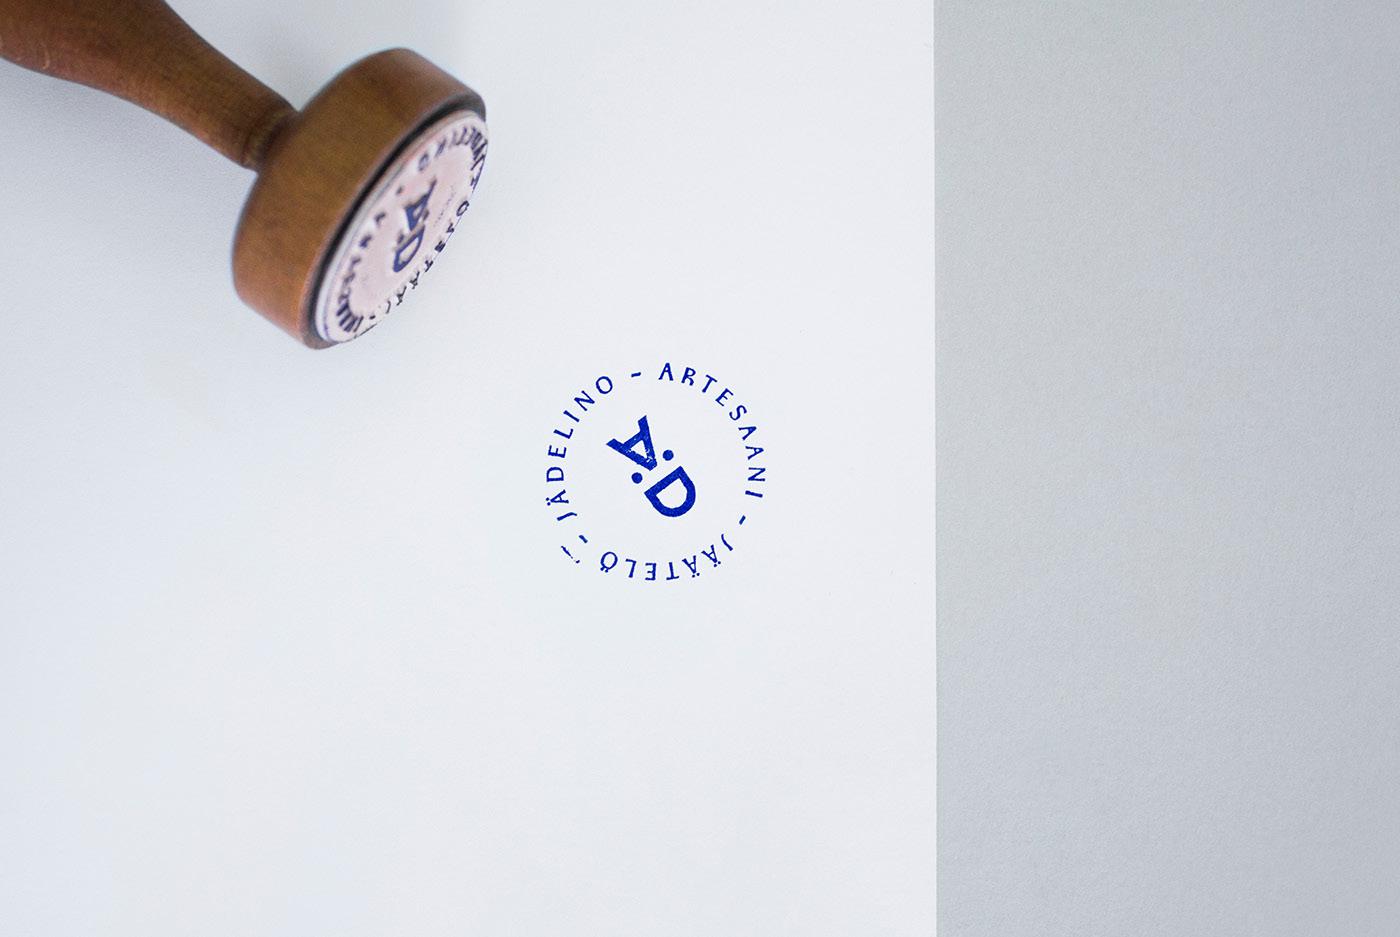 ice cream Food  cup stamp smile asrtisan craft shop Web